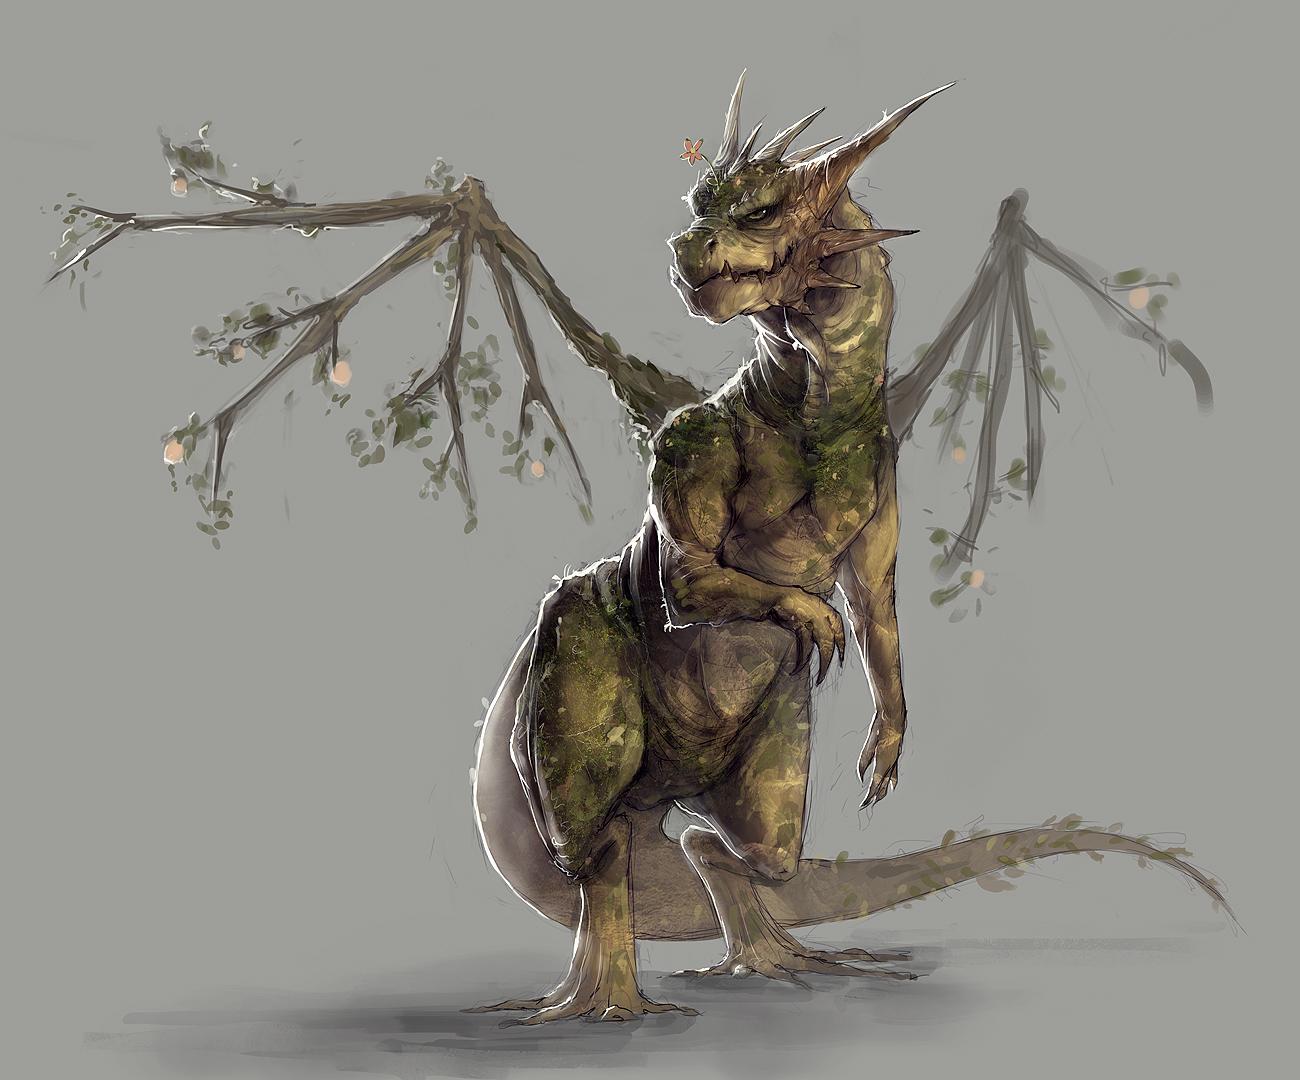 Earth Dragon: Earth/nature Dragon By MrNepa On DeviantArt